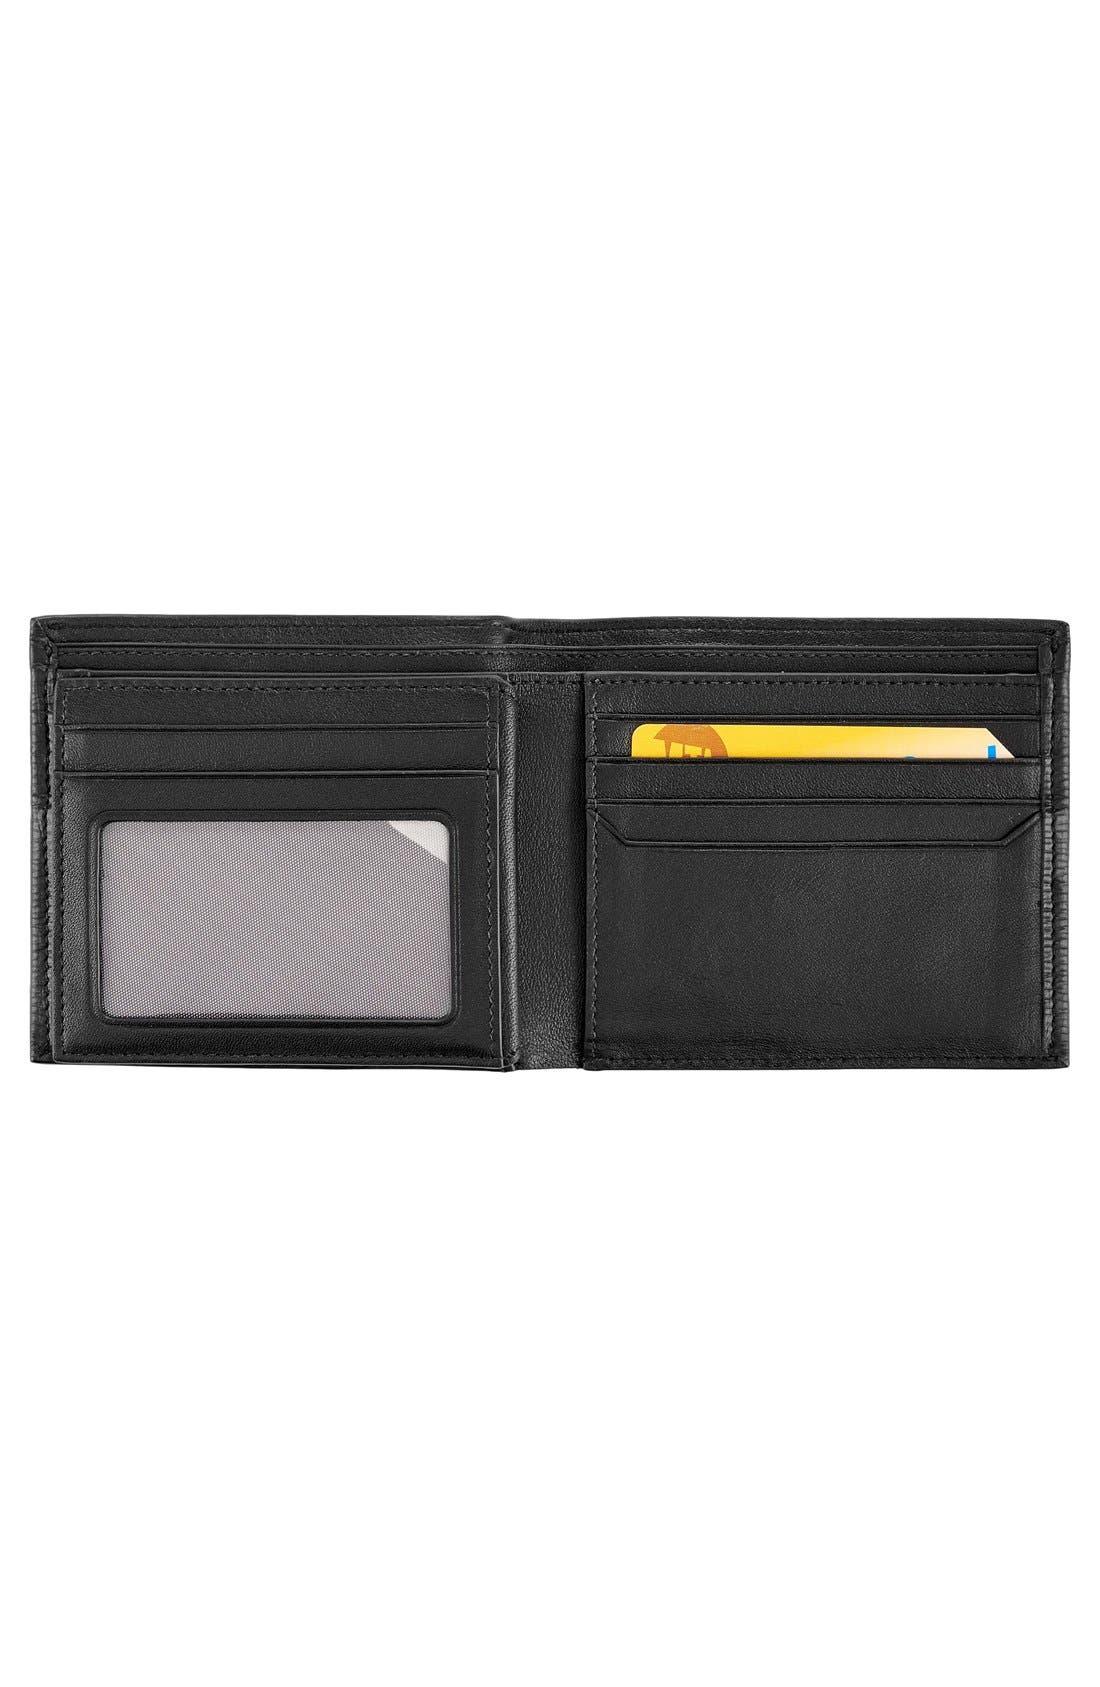 Monaco Global Billfold Wallet,                             Alternate thumbnail 2, color,                             Black